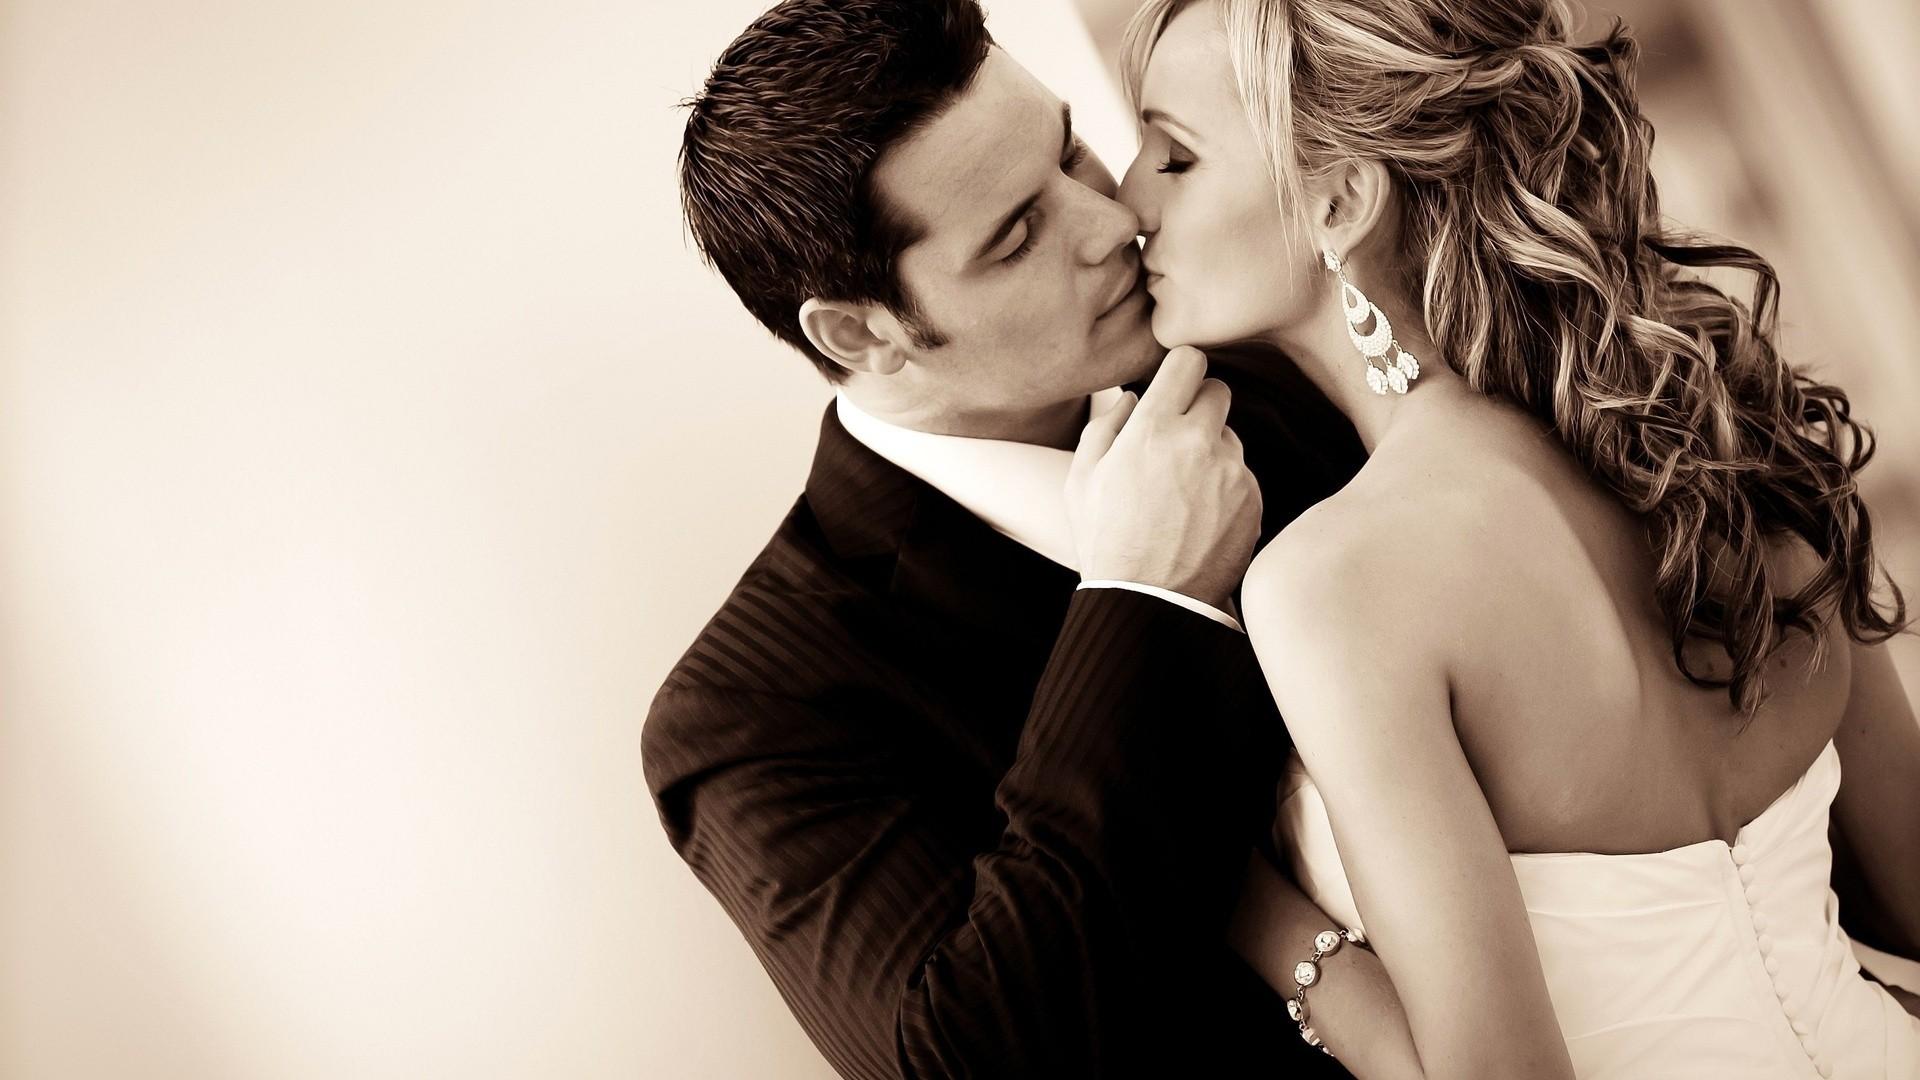 kiss-vintage-wedding-wallpaper.jpg